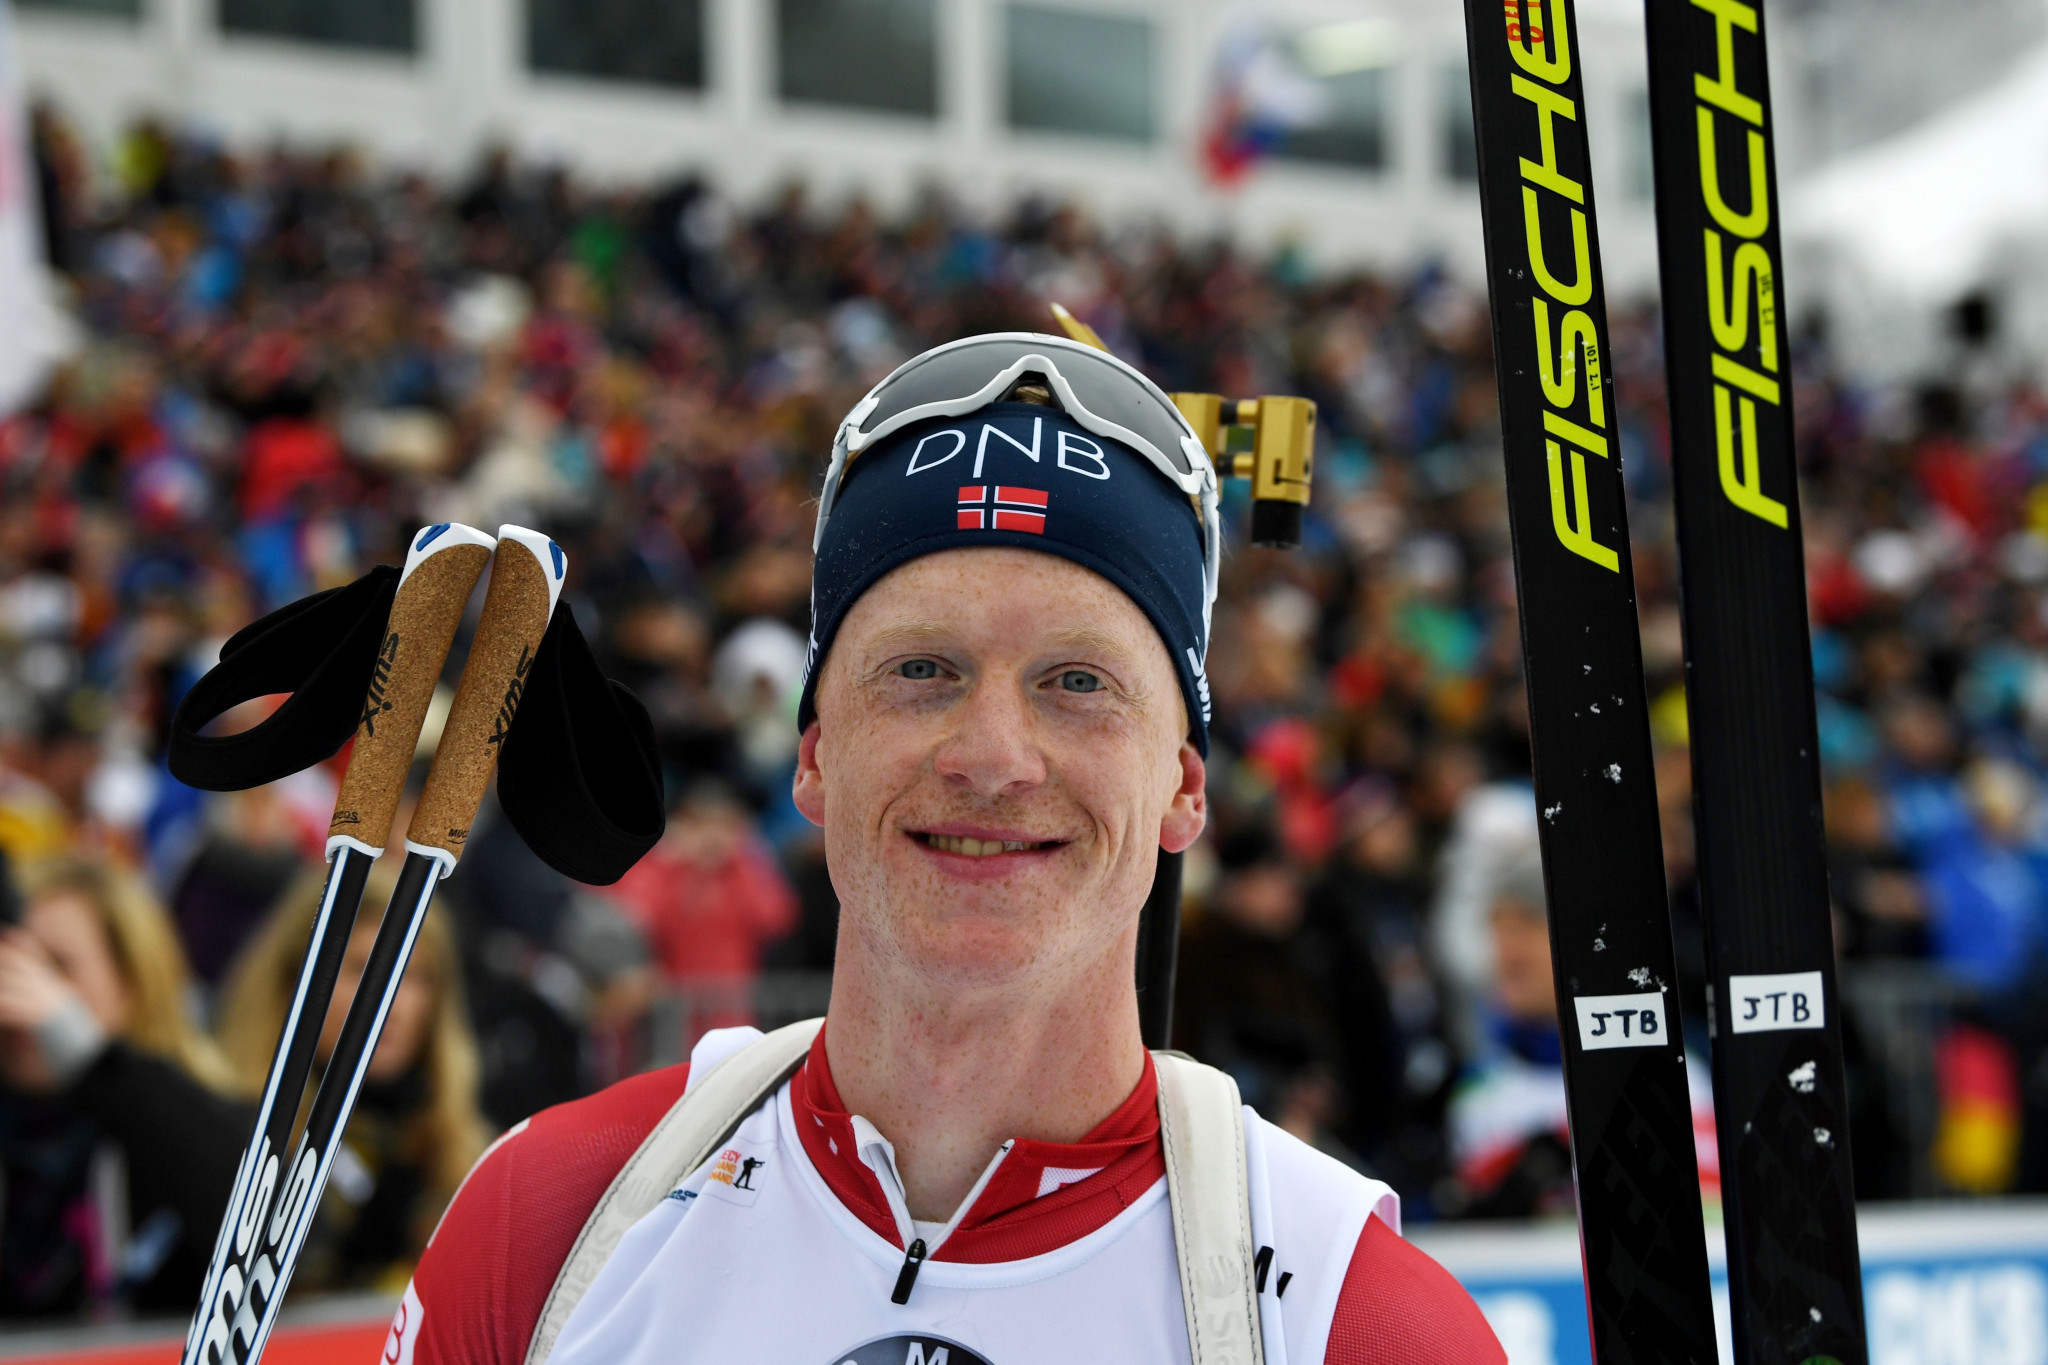 IBU Biathlon World Cup set for first of two legs in Hochfilzen